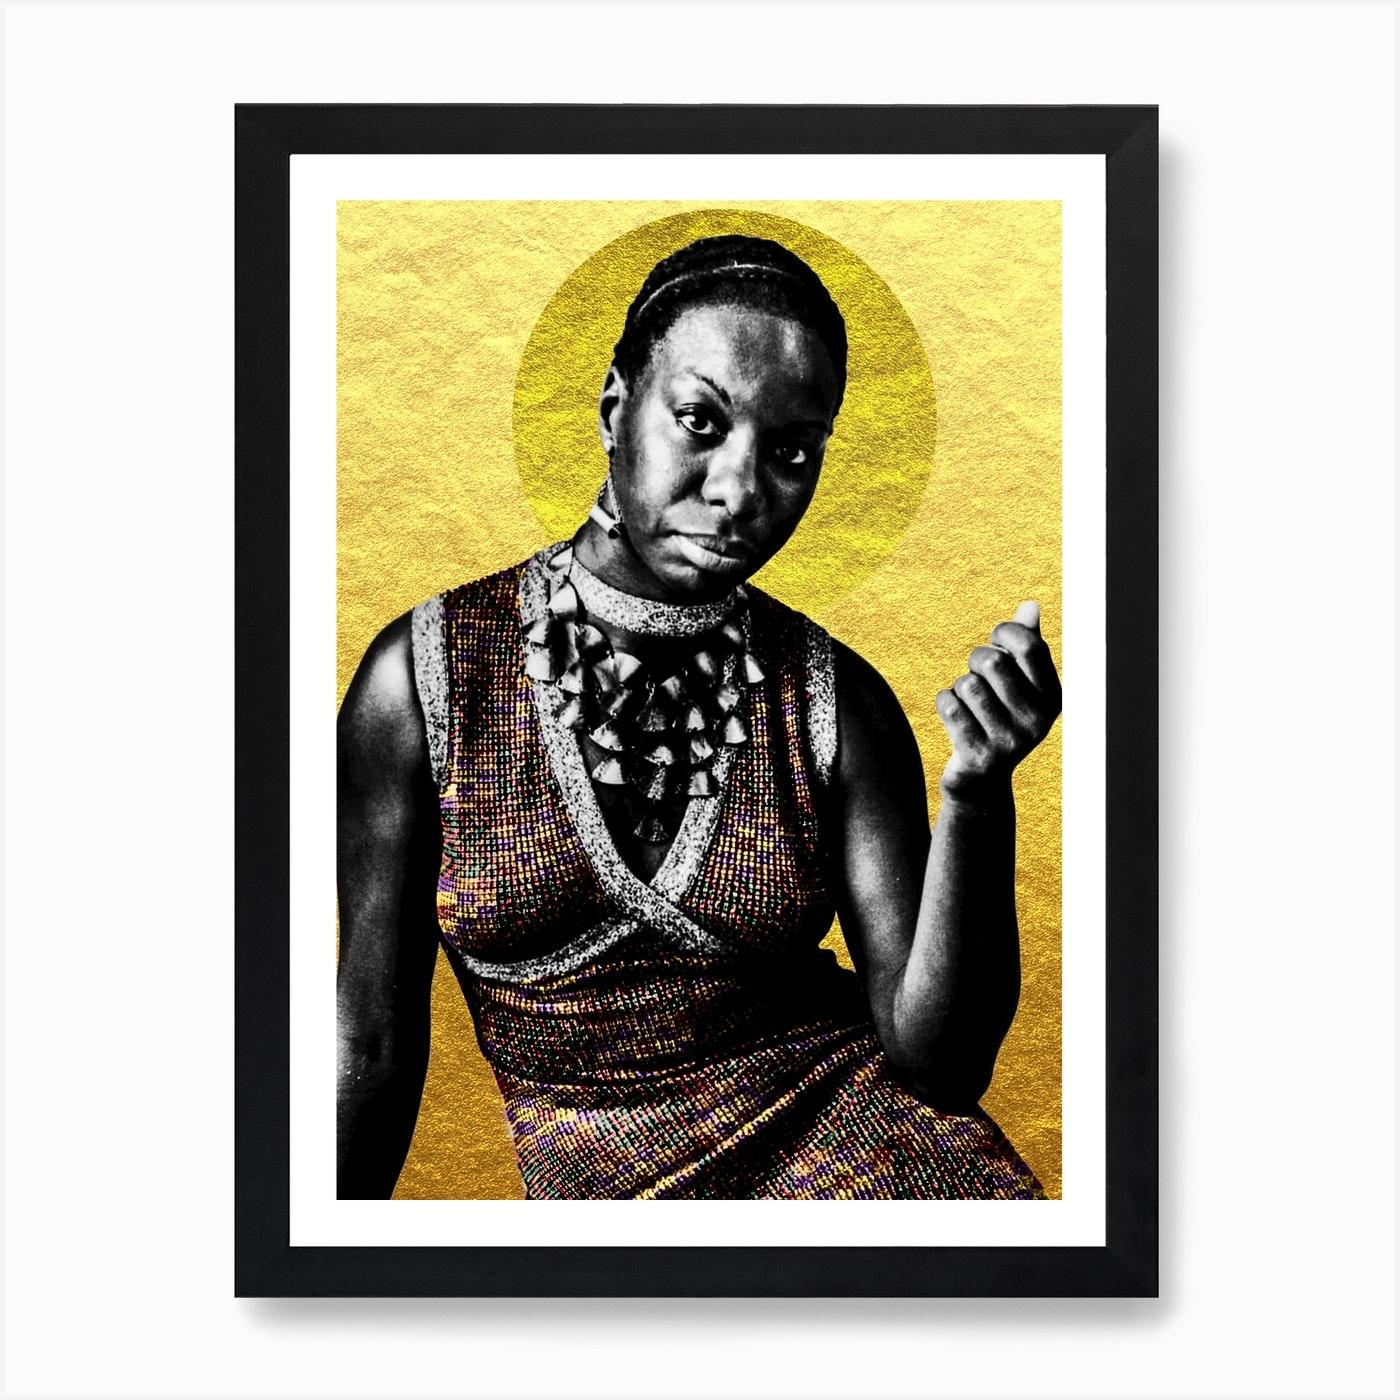 Nina Simone Art Print by Arte Fama - Fy